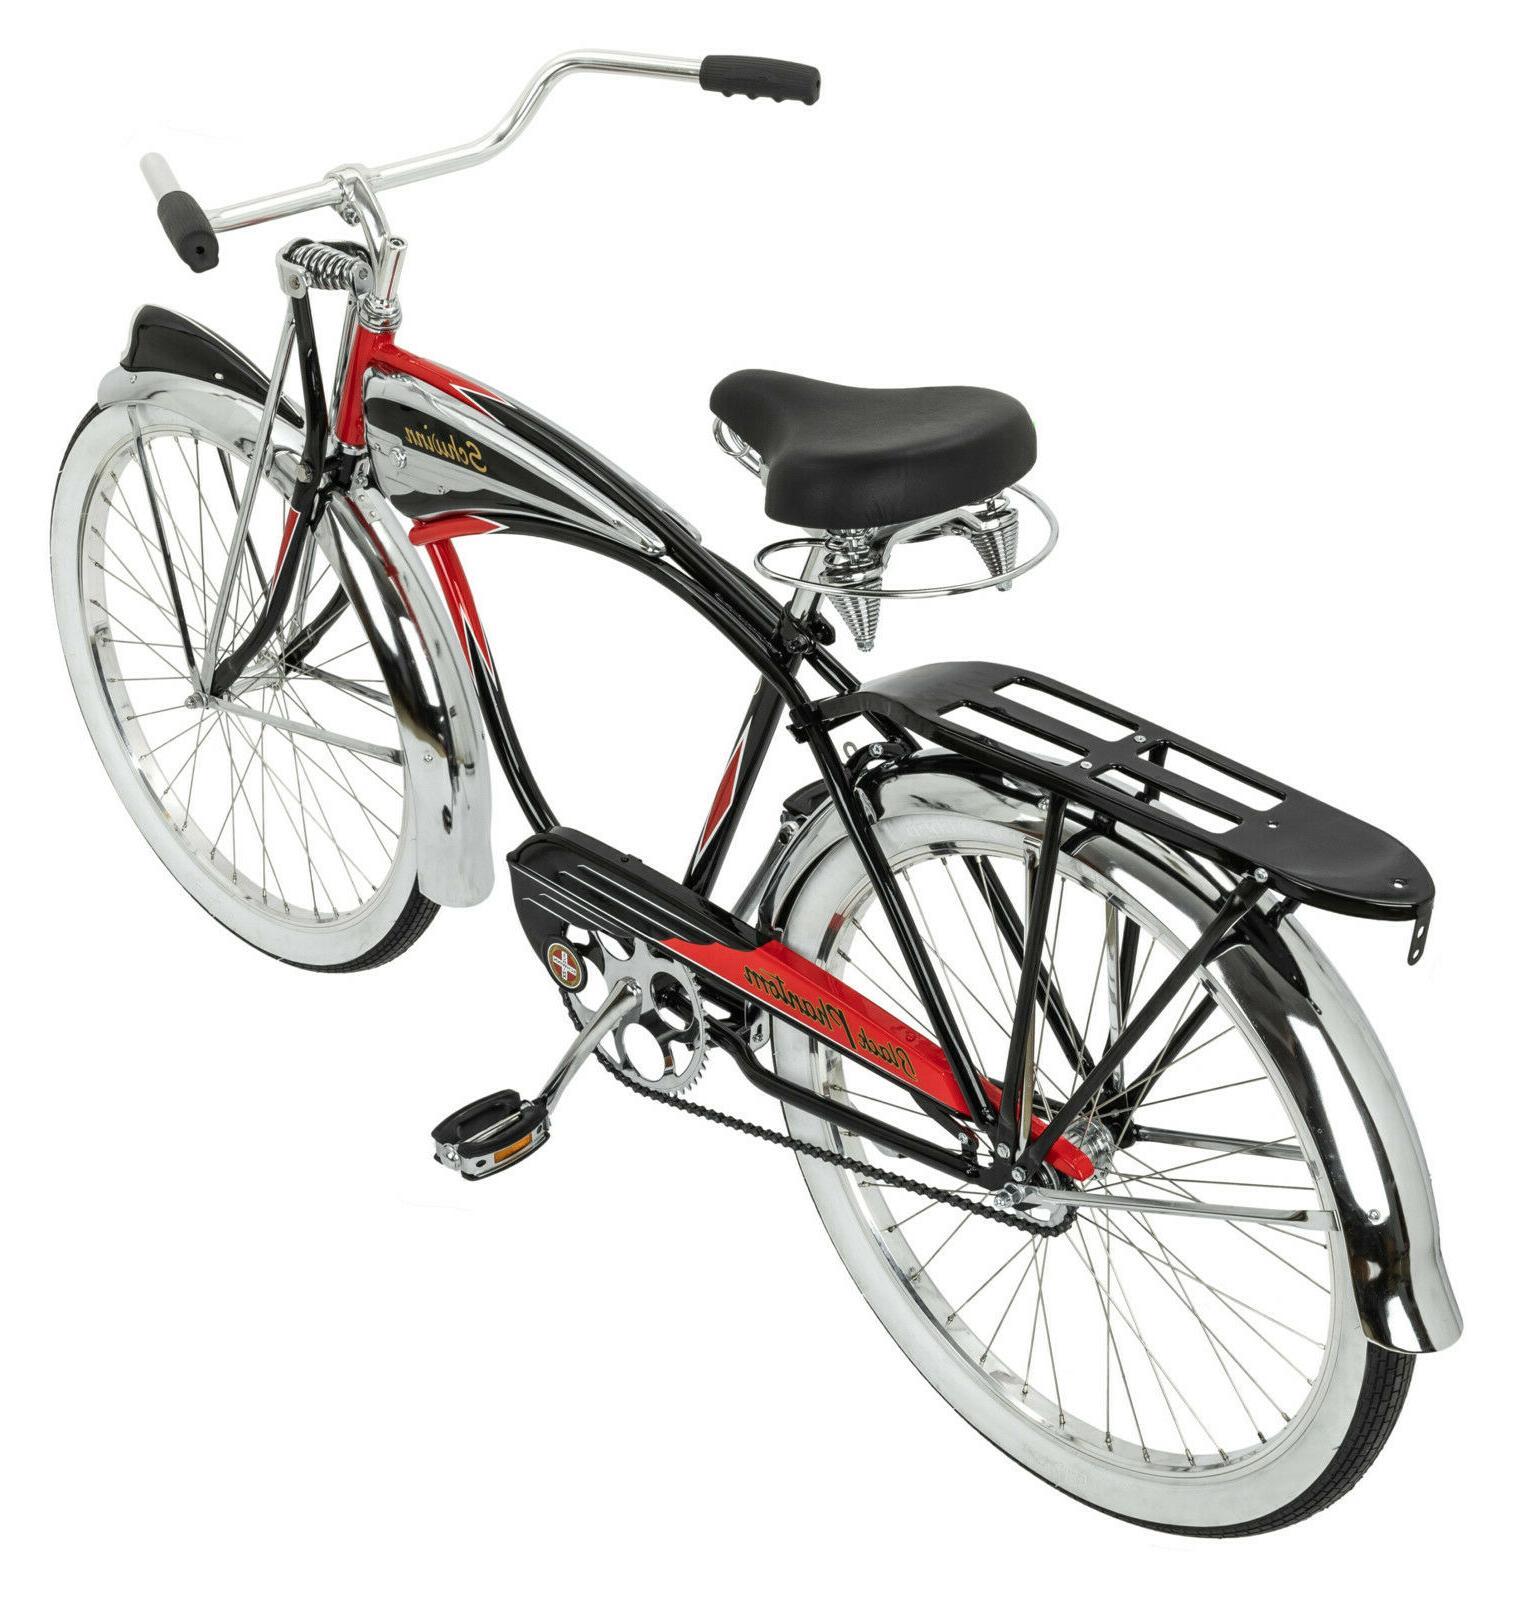 Schwinn Cruiser Bike, single speed, 26-inch wheels,